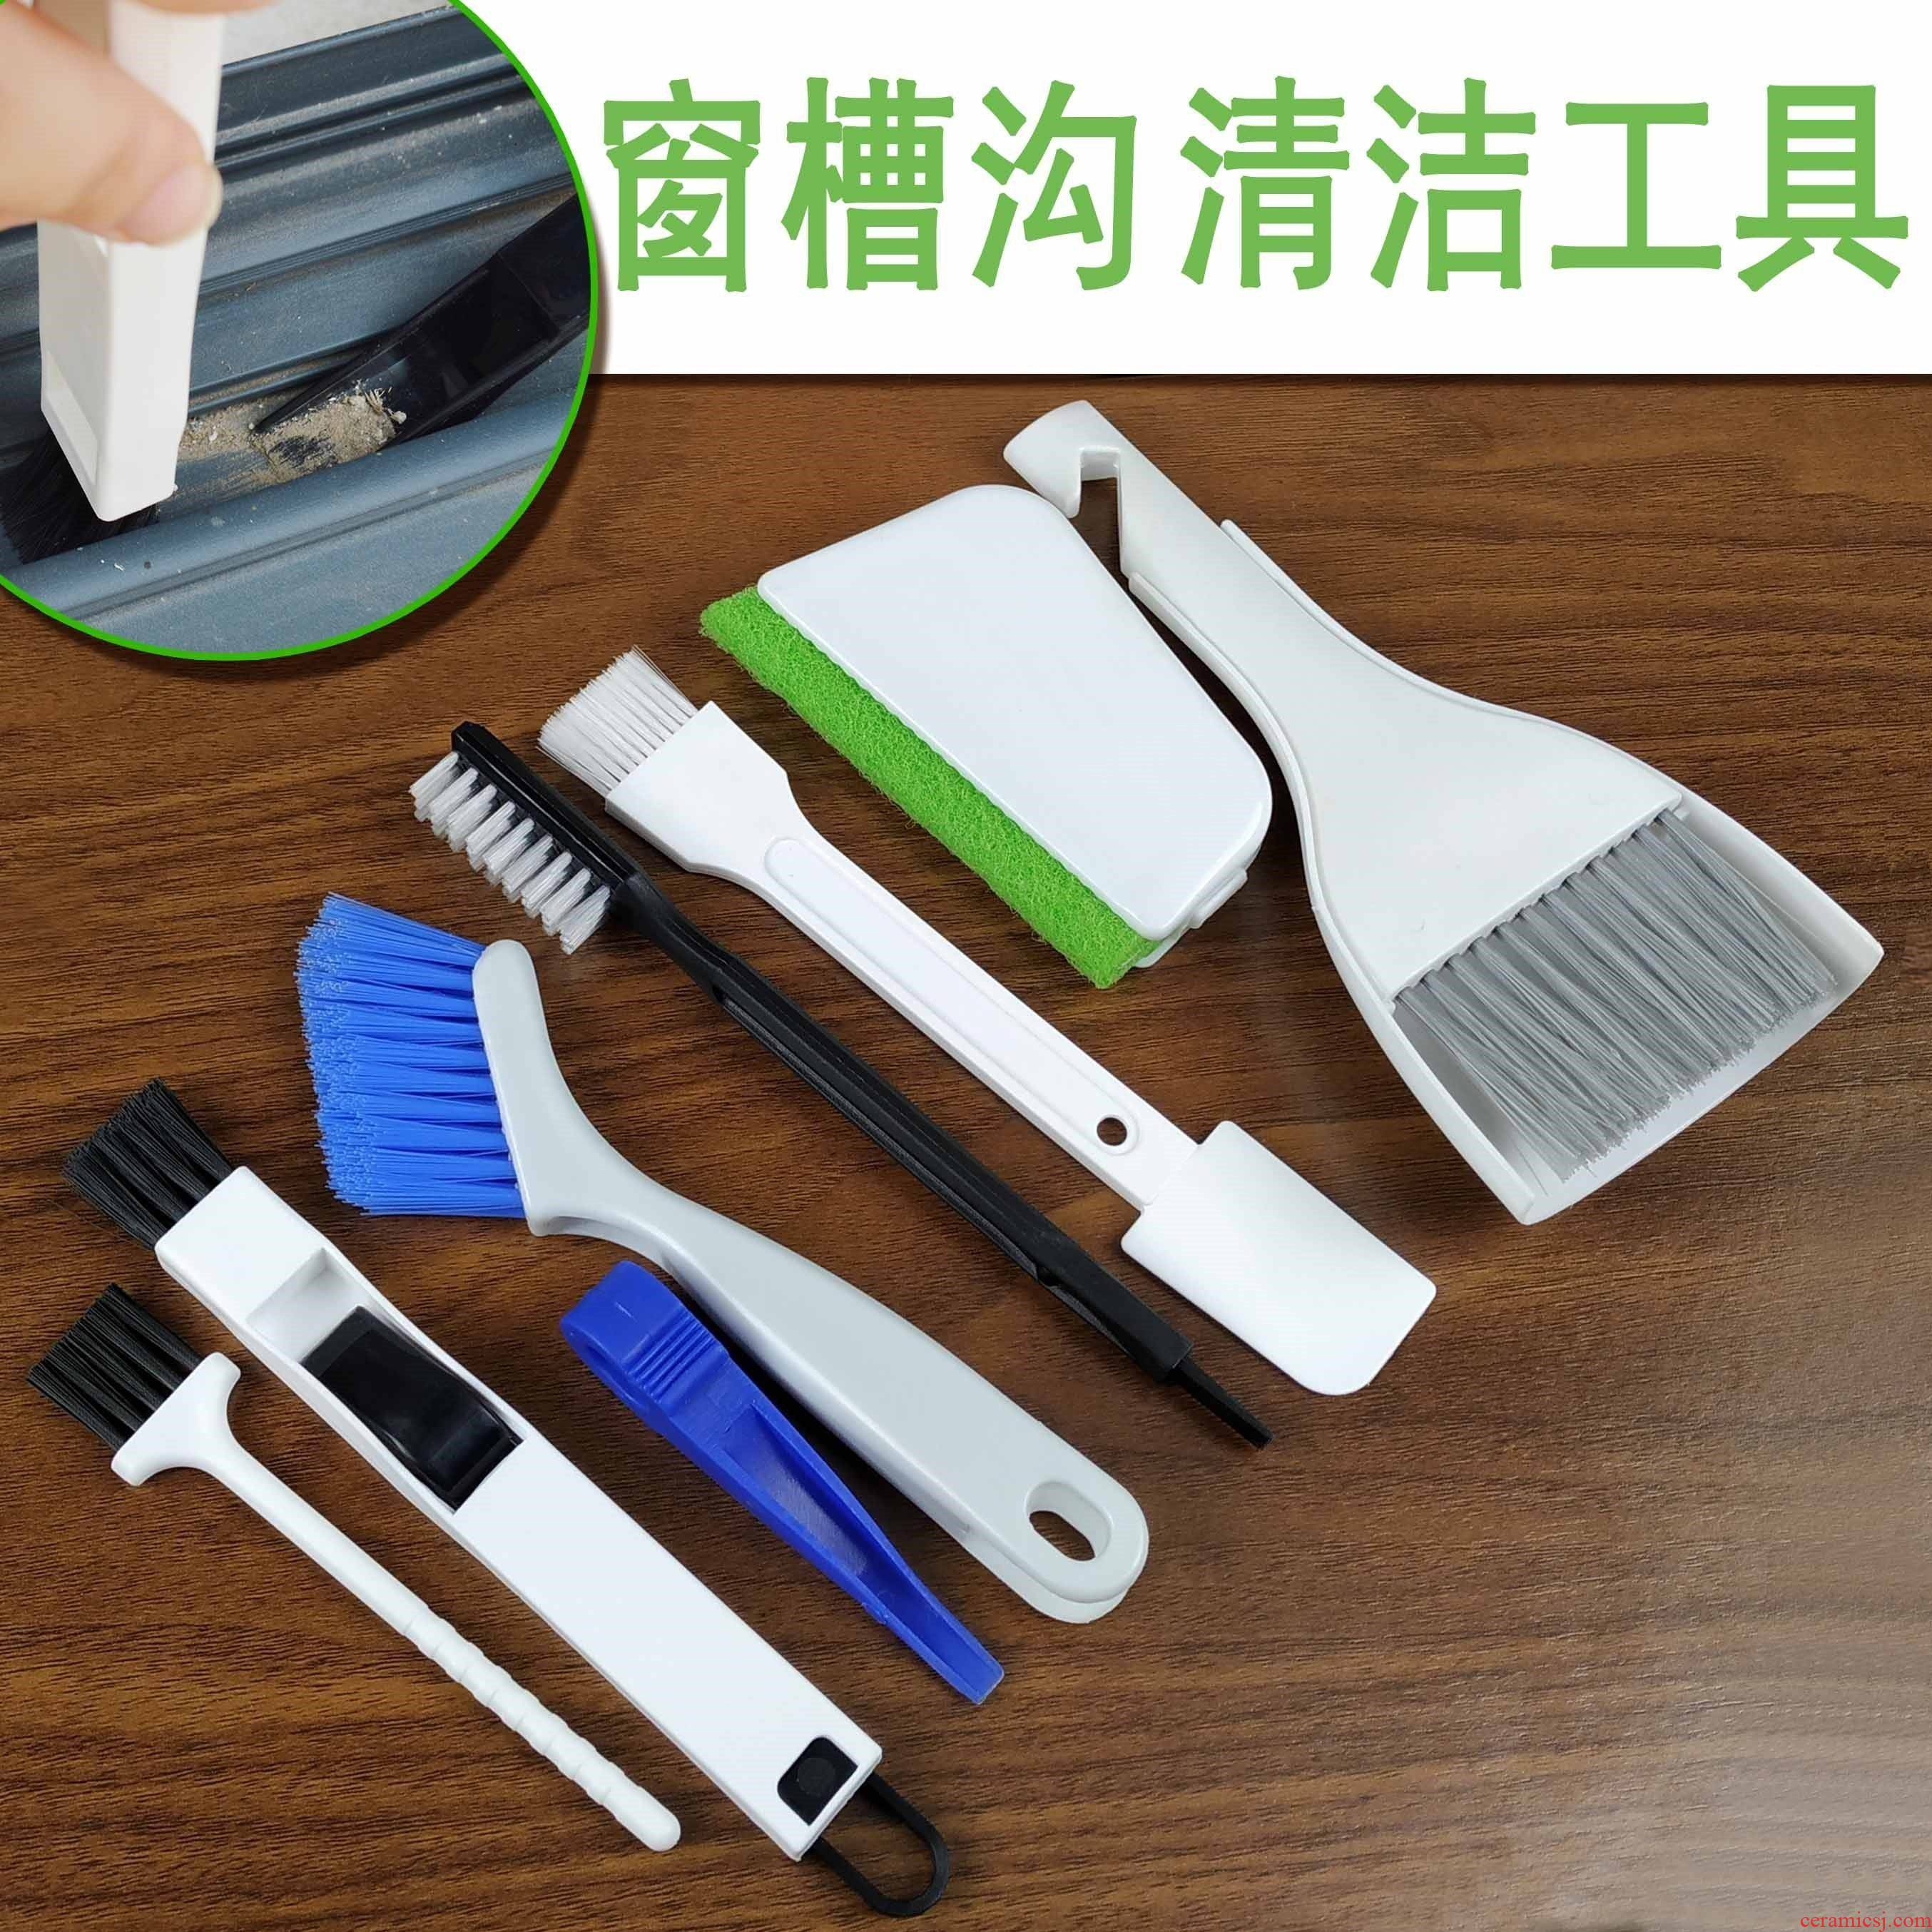 Brush the floor corner window cleaning Windows feel corner of household ceramic tile aperture cleaning tools